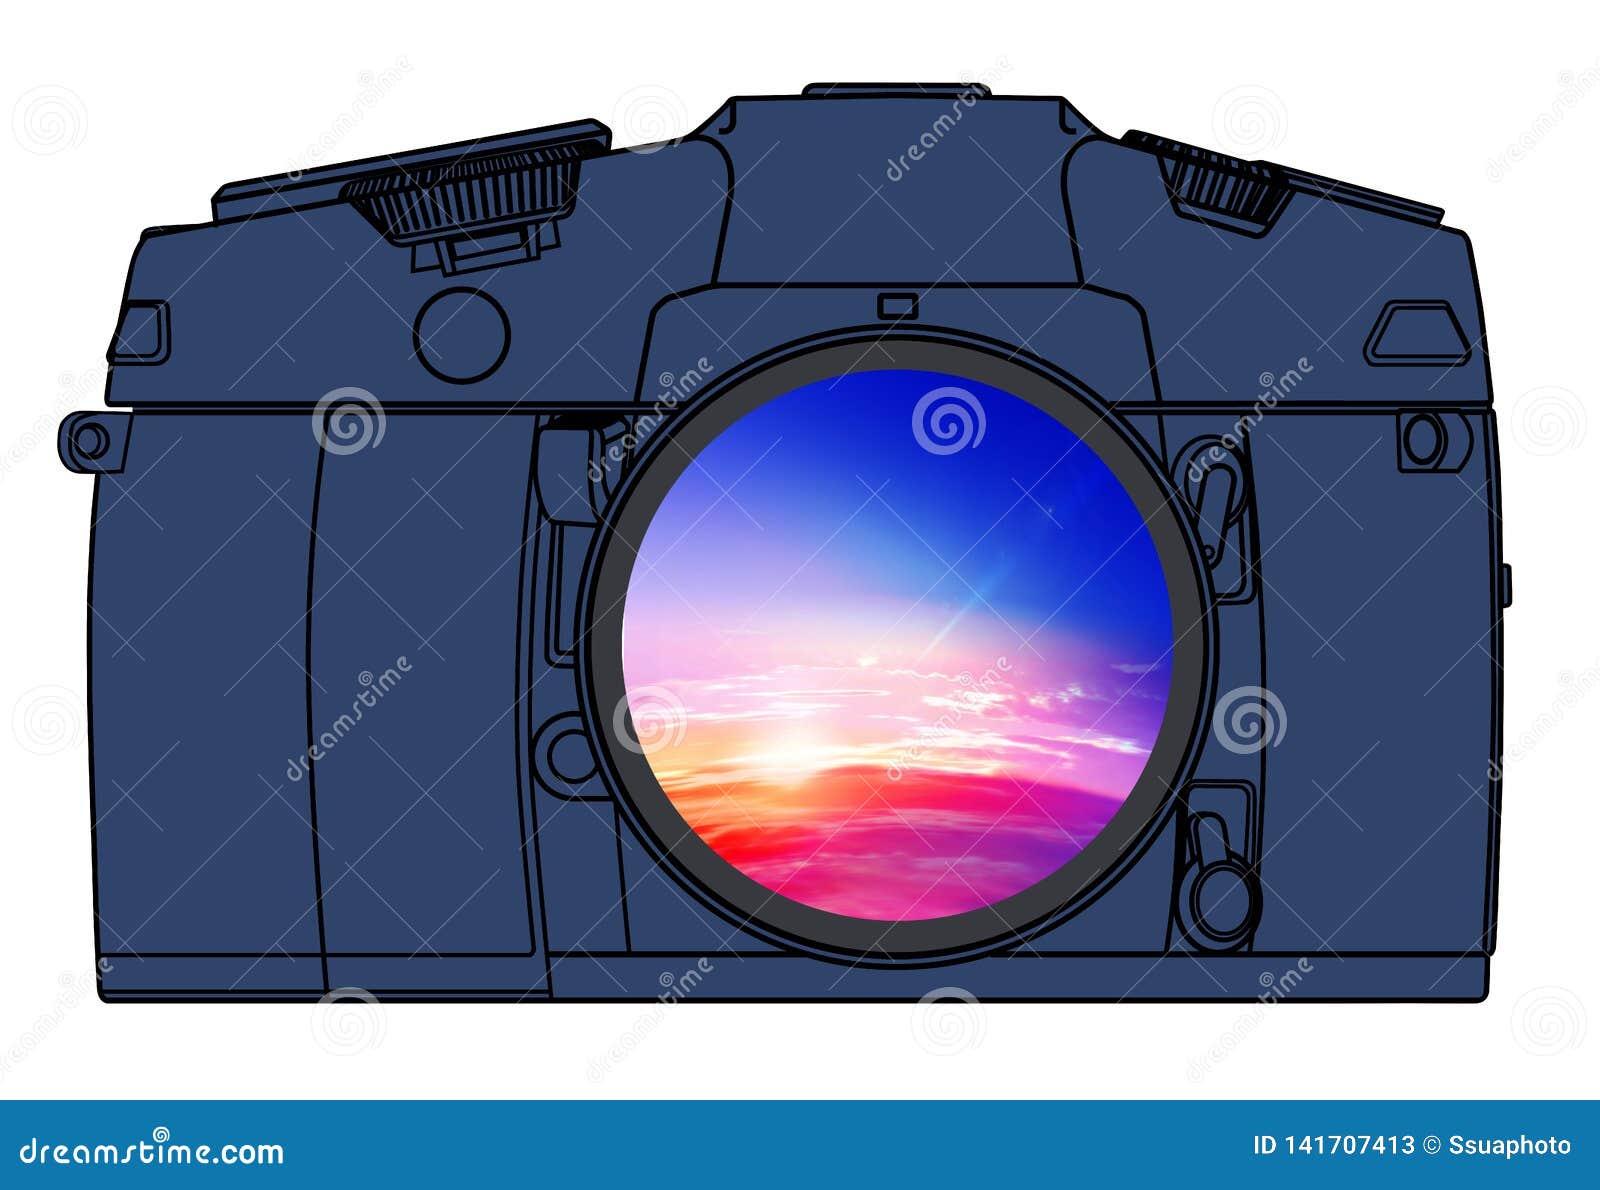 Photo camera isolated